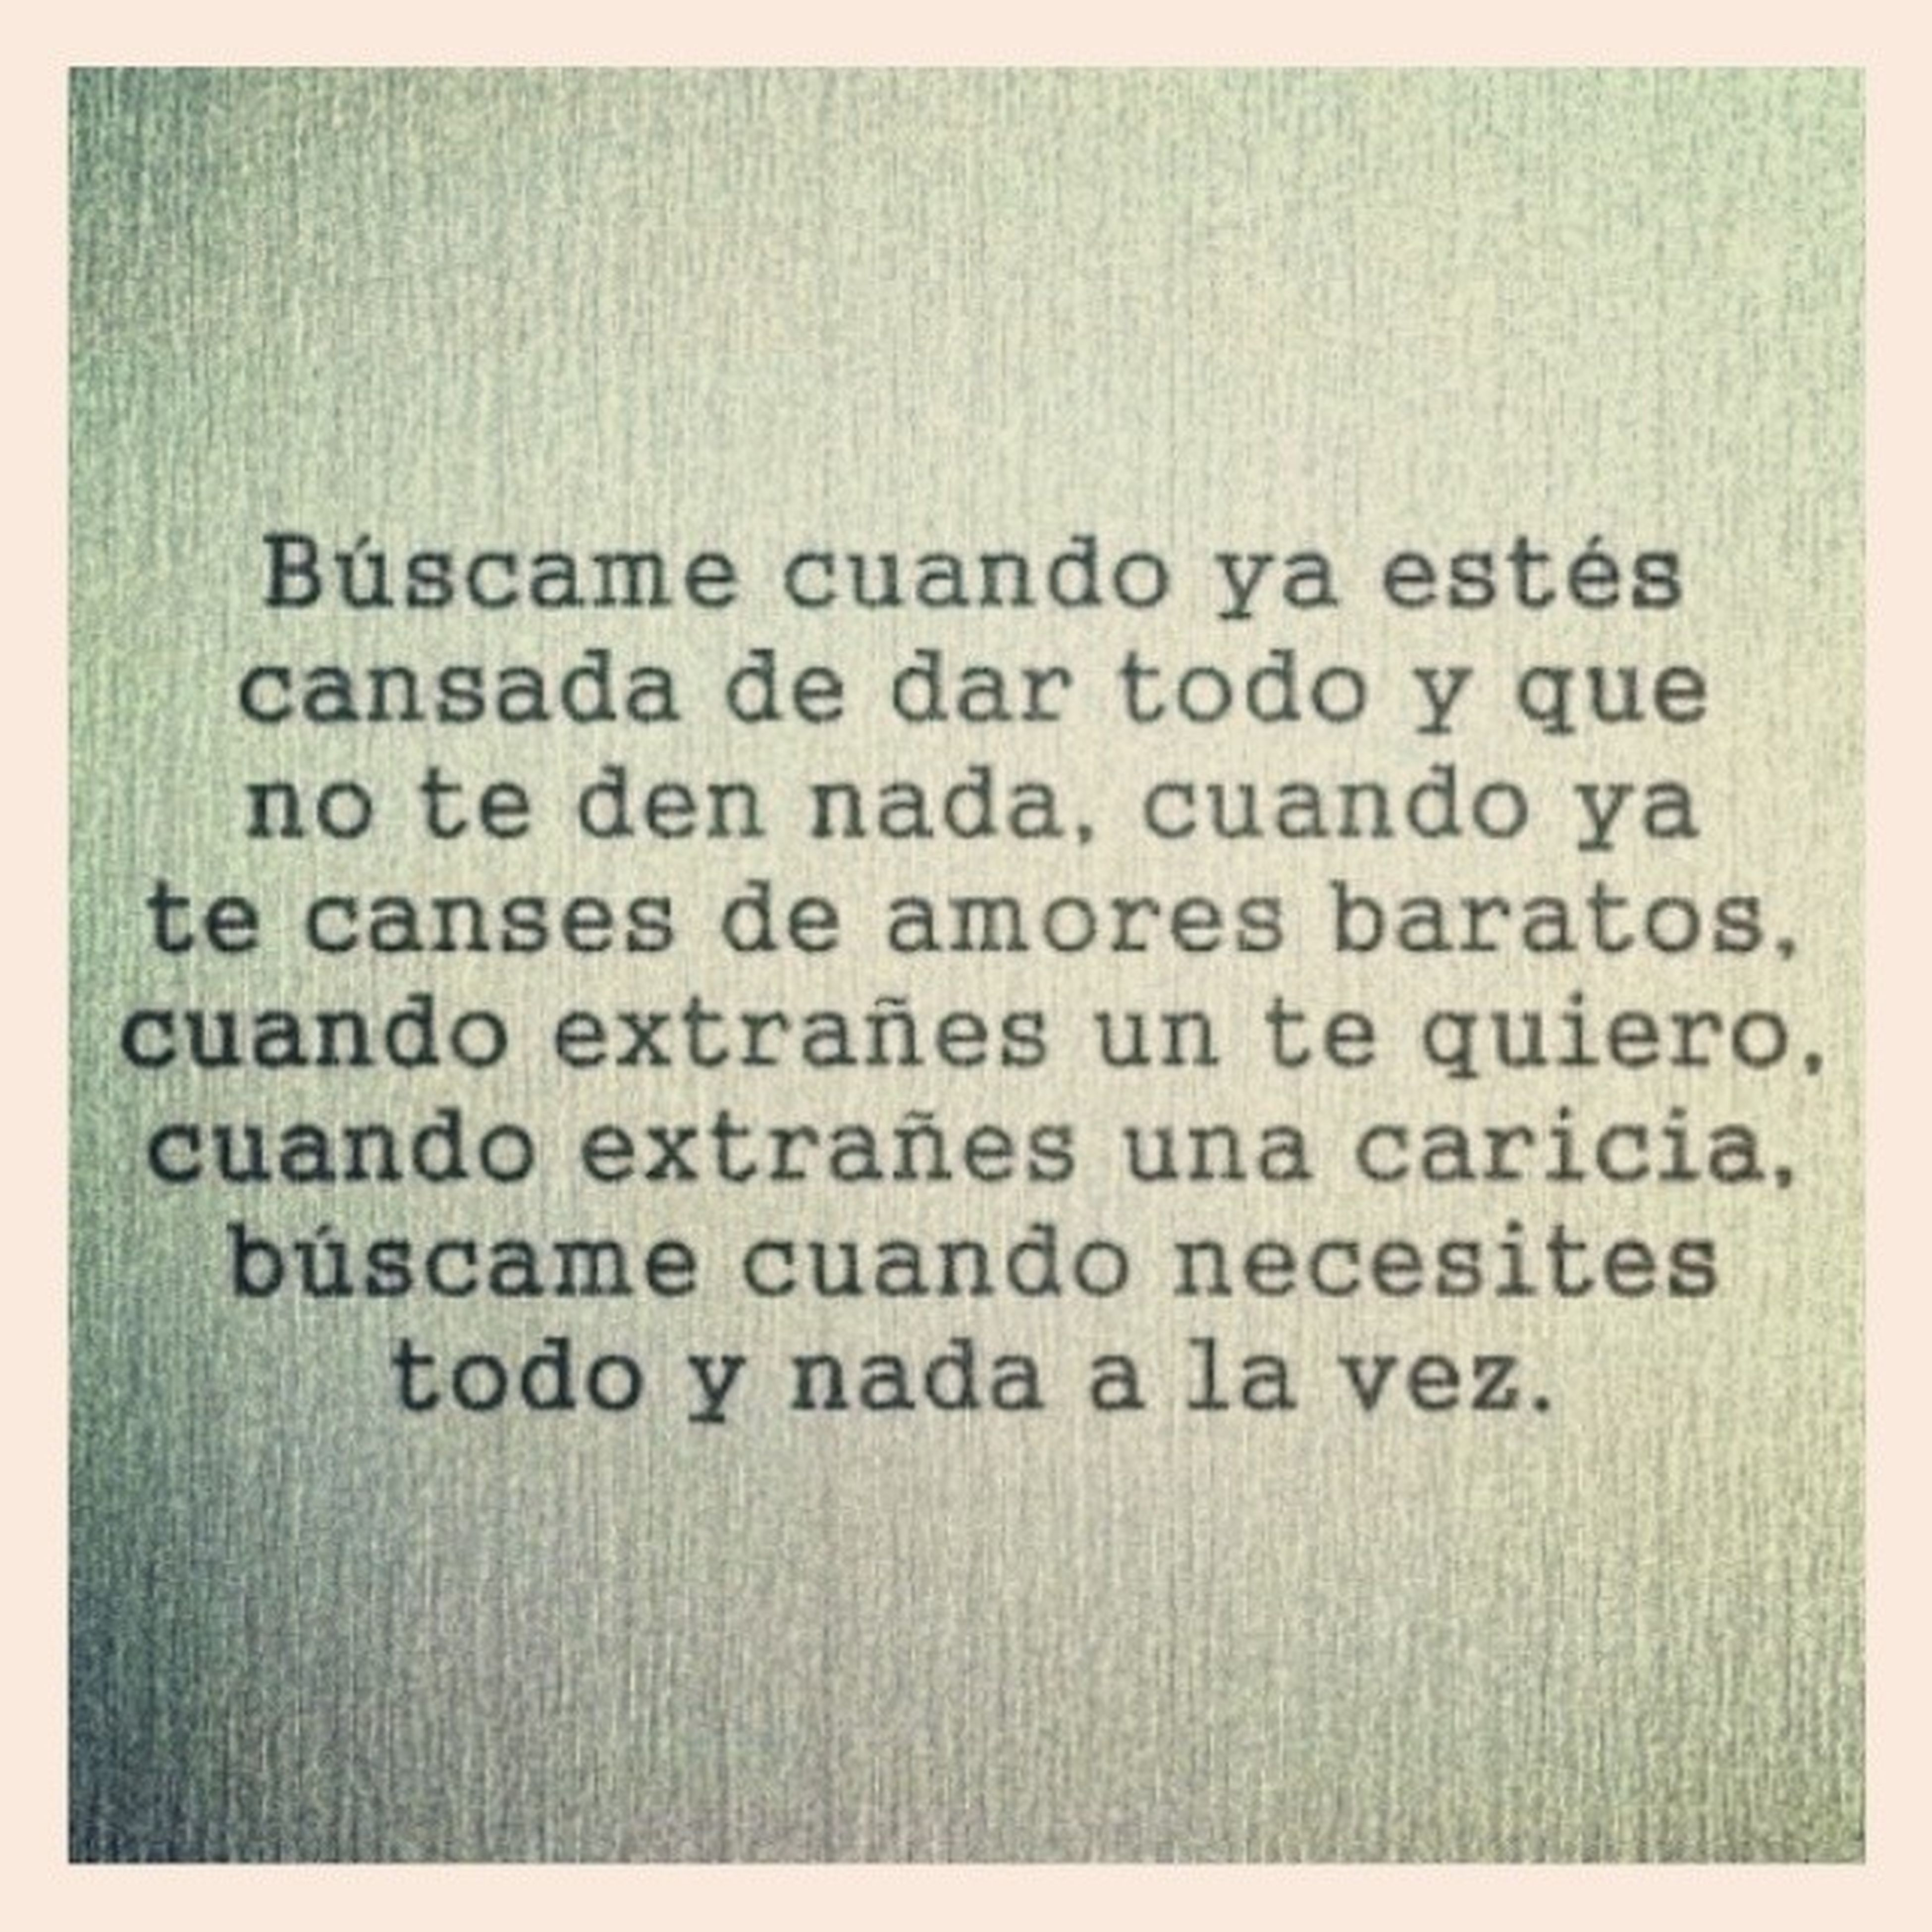 Buscame Amor Genuino Followcarlitosgonzalez tumblr dhomgonzalez tumblrican boricua PuertoRico PR Borinquen